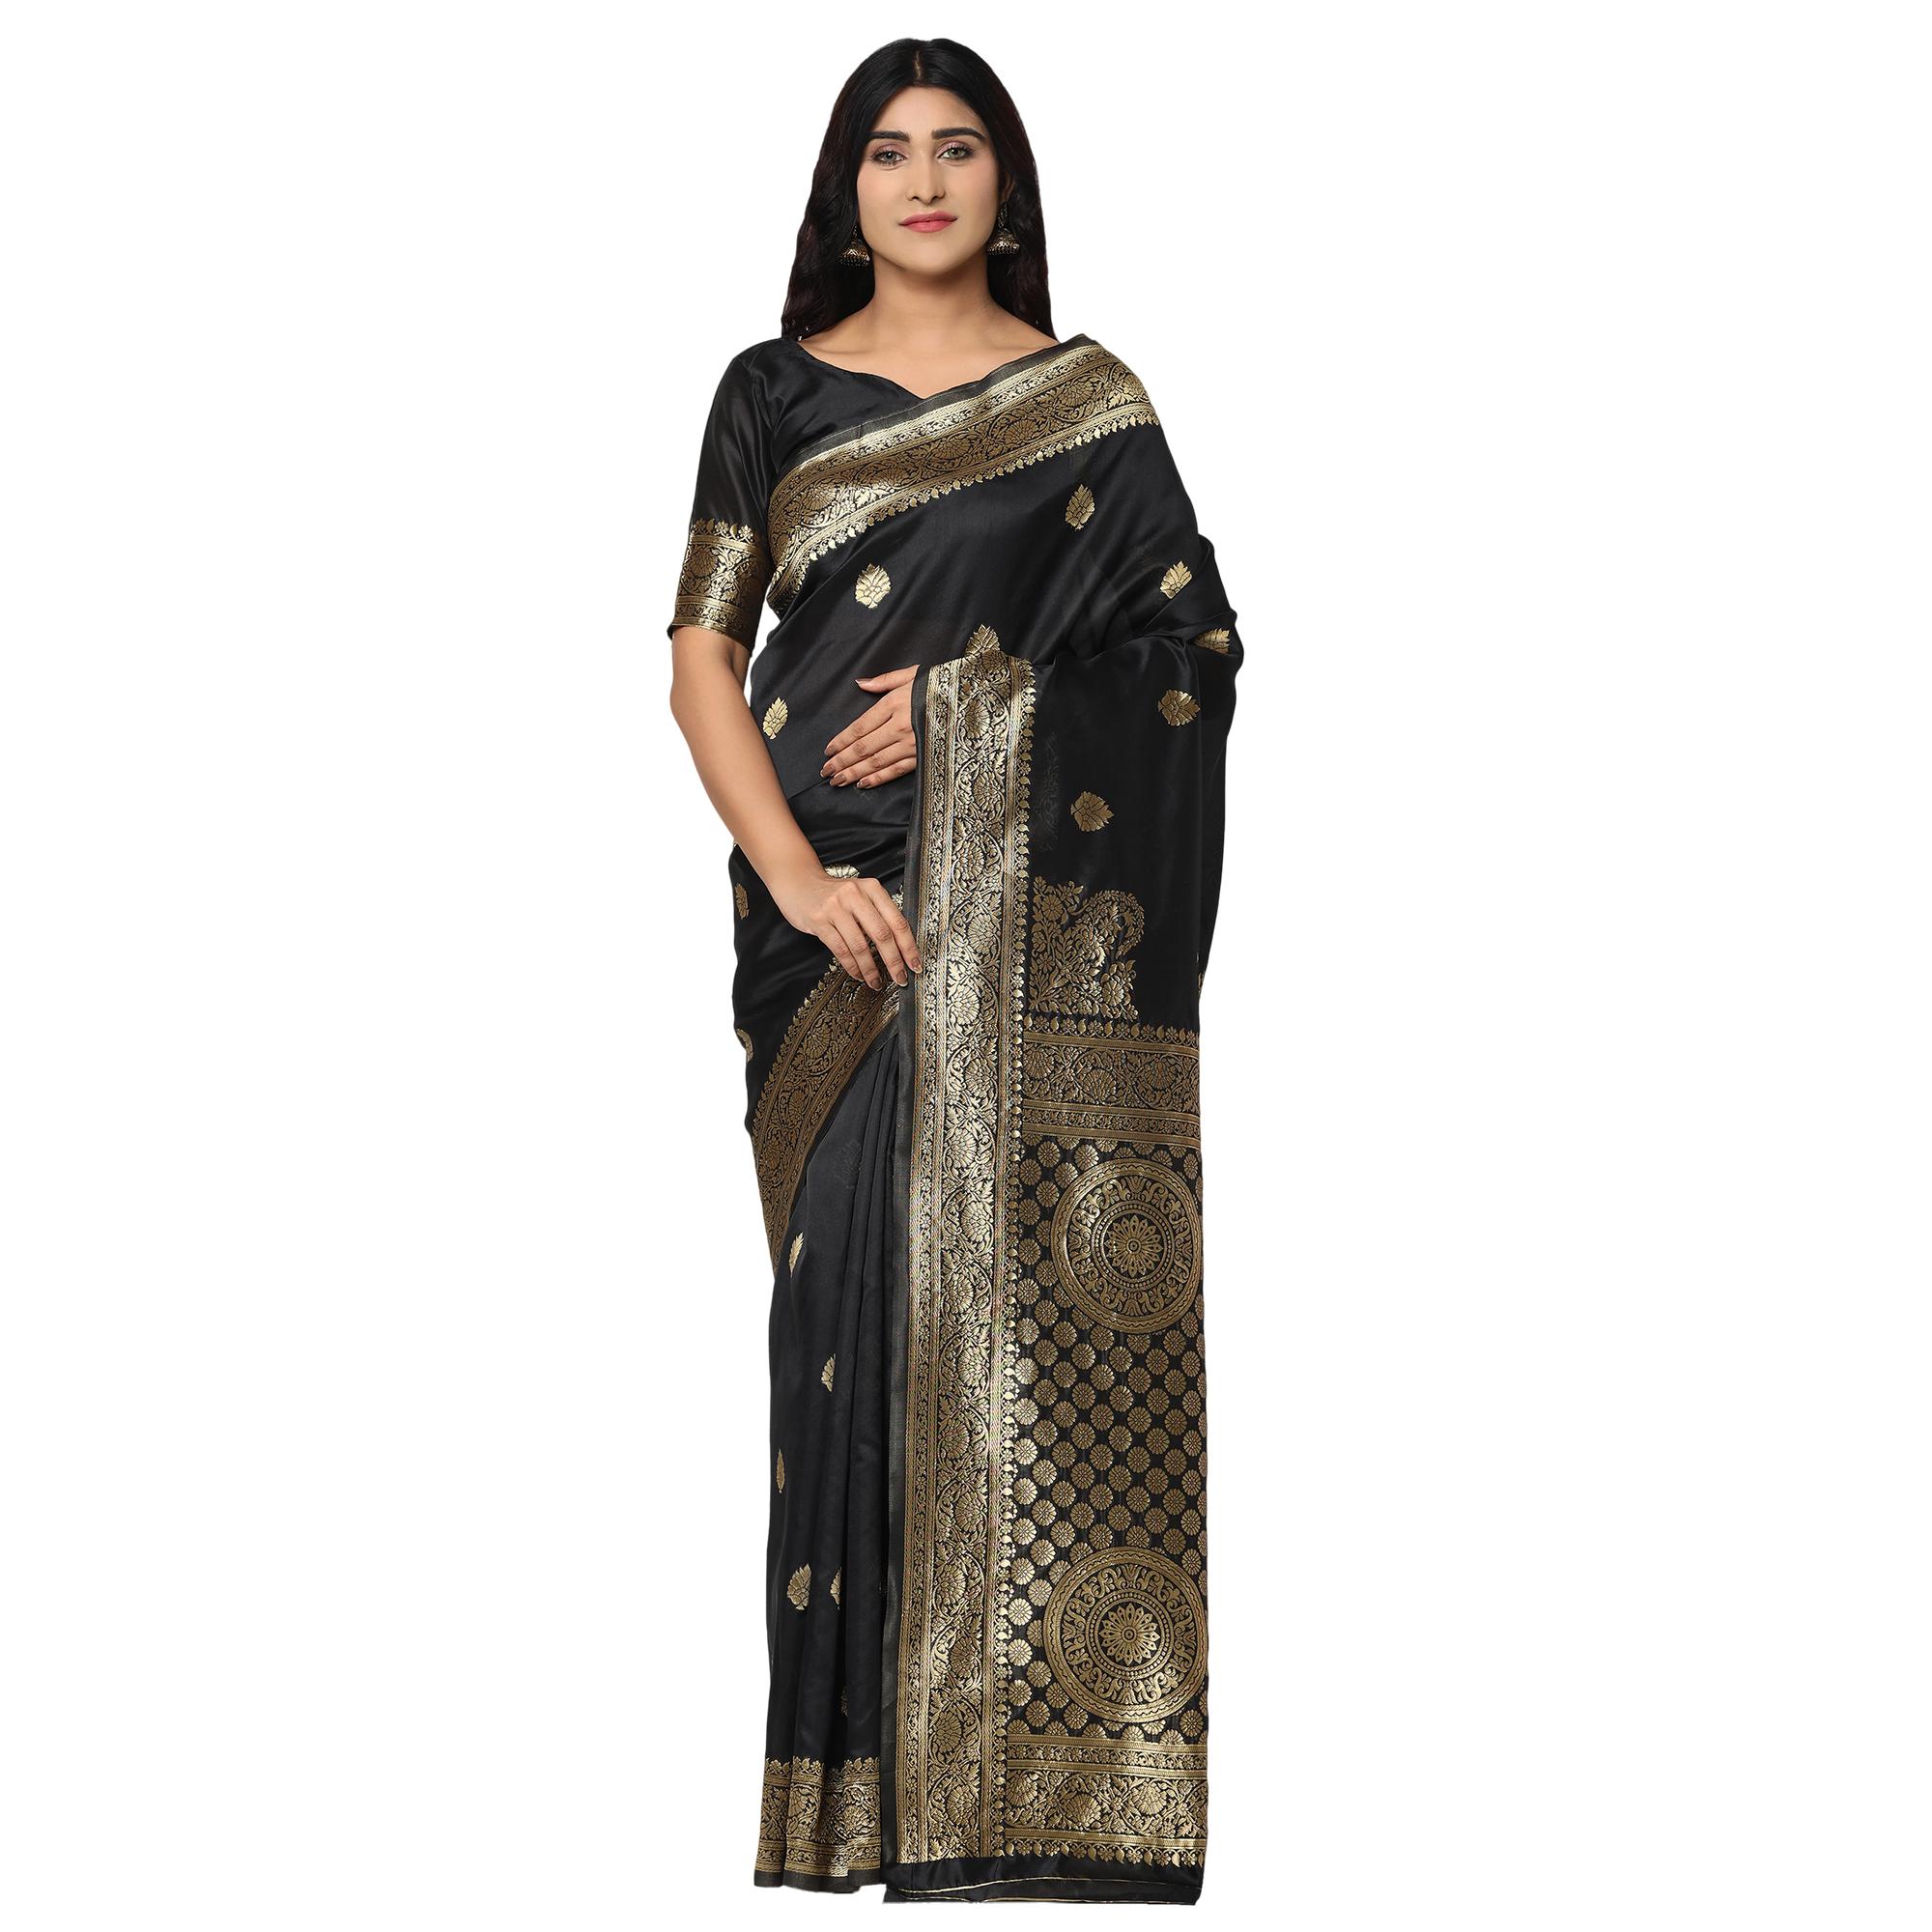 Glemora | Glemora Black Fancy Ethnic Wear Silk Blend Banarasi Traditional Saree